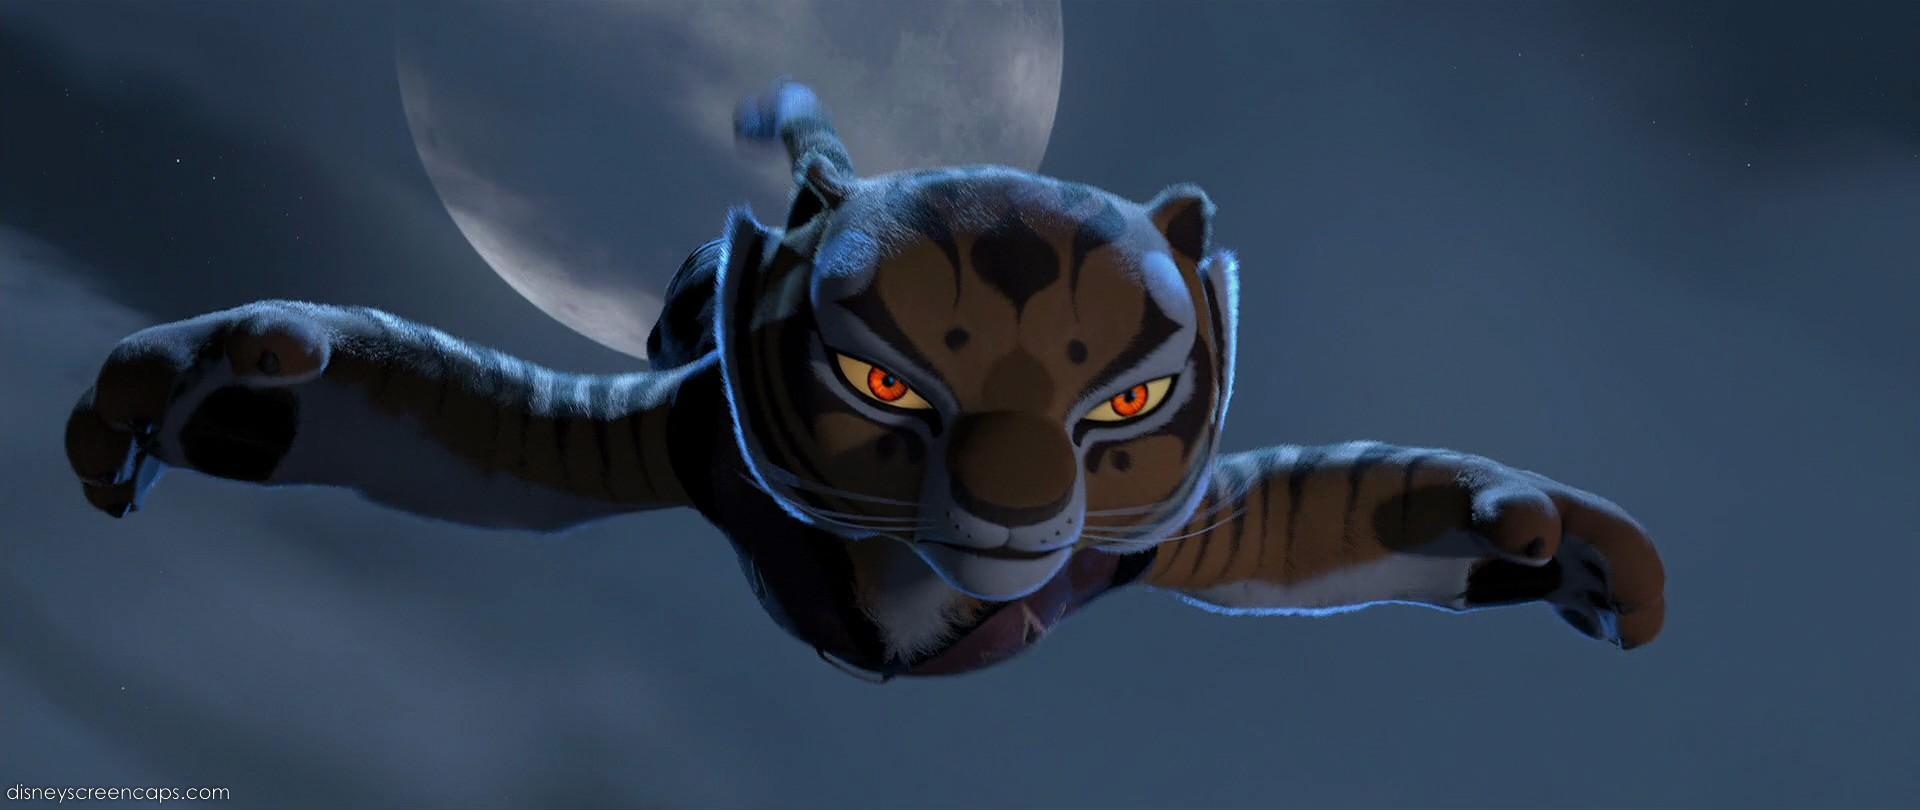 image - tigress-in-air | kung fu panda wiki | fandom powered